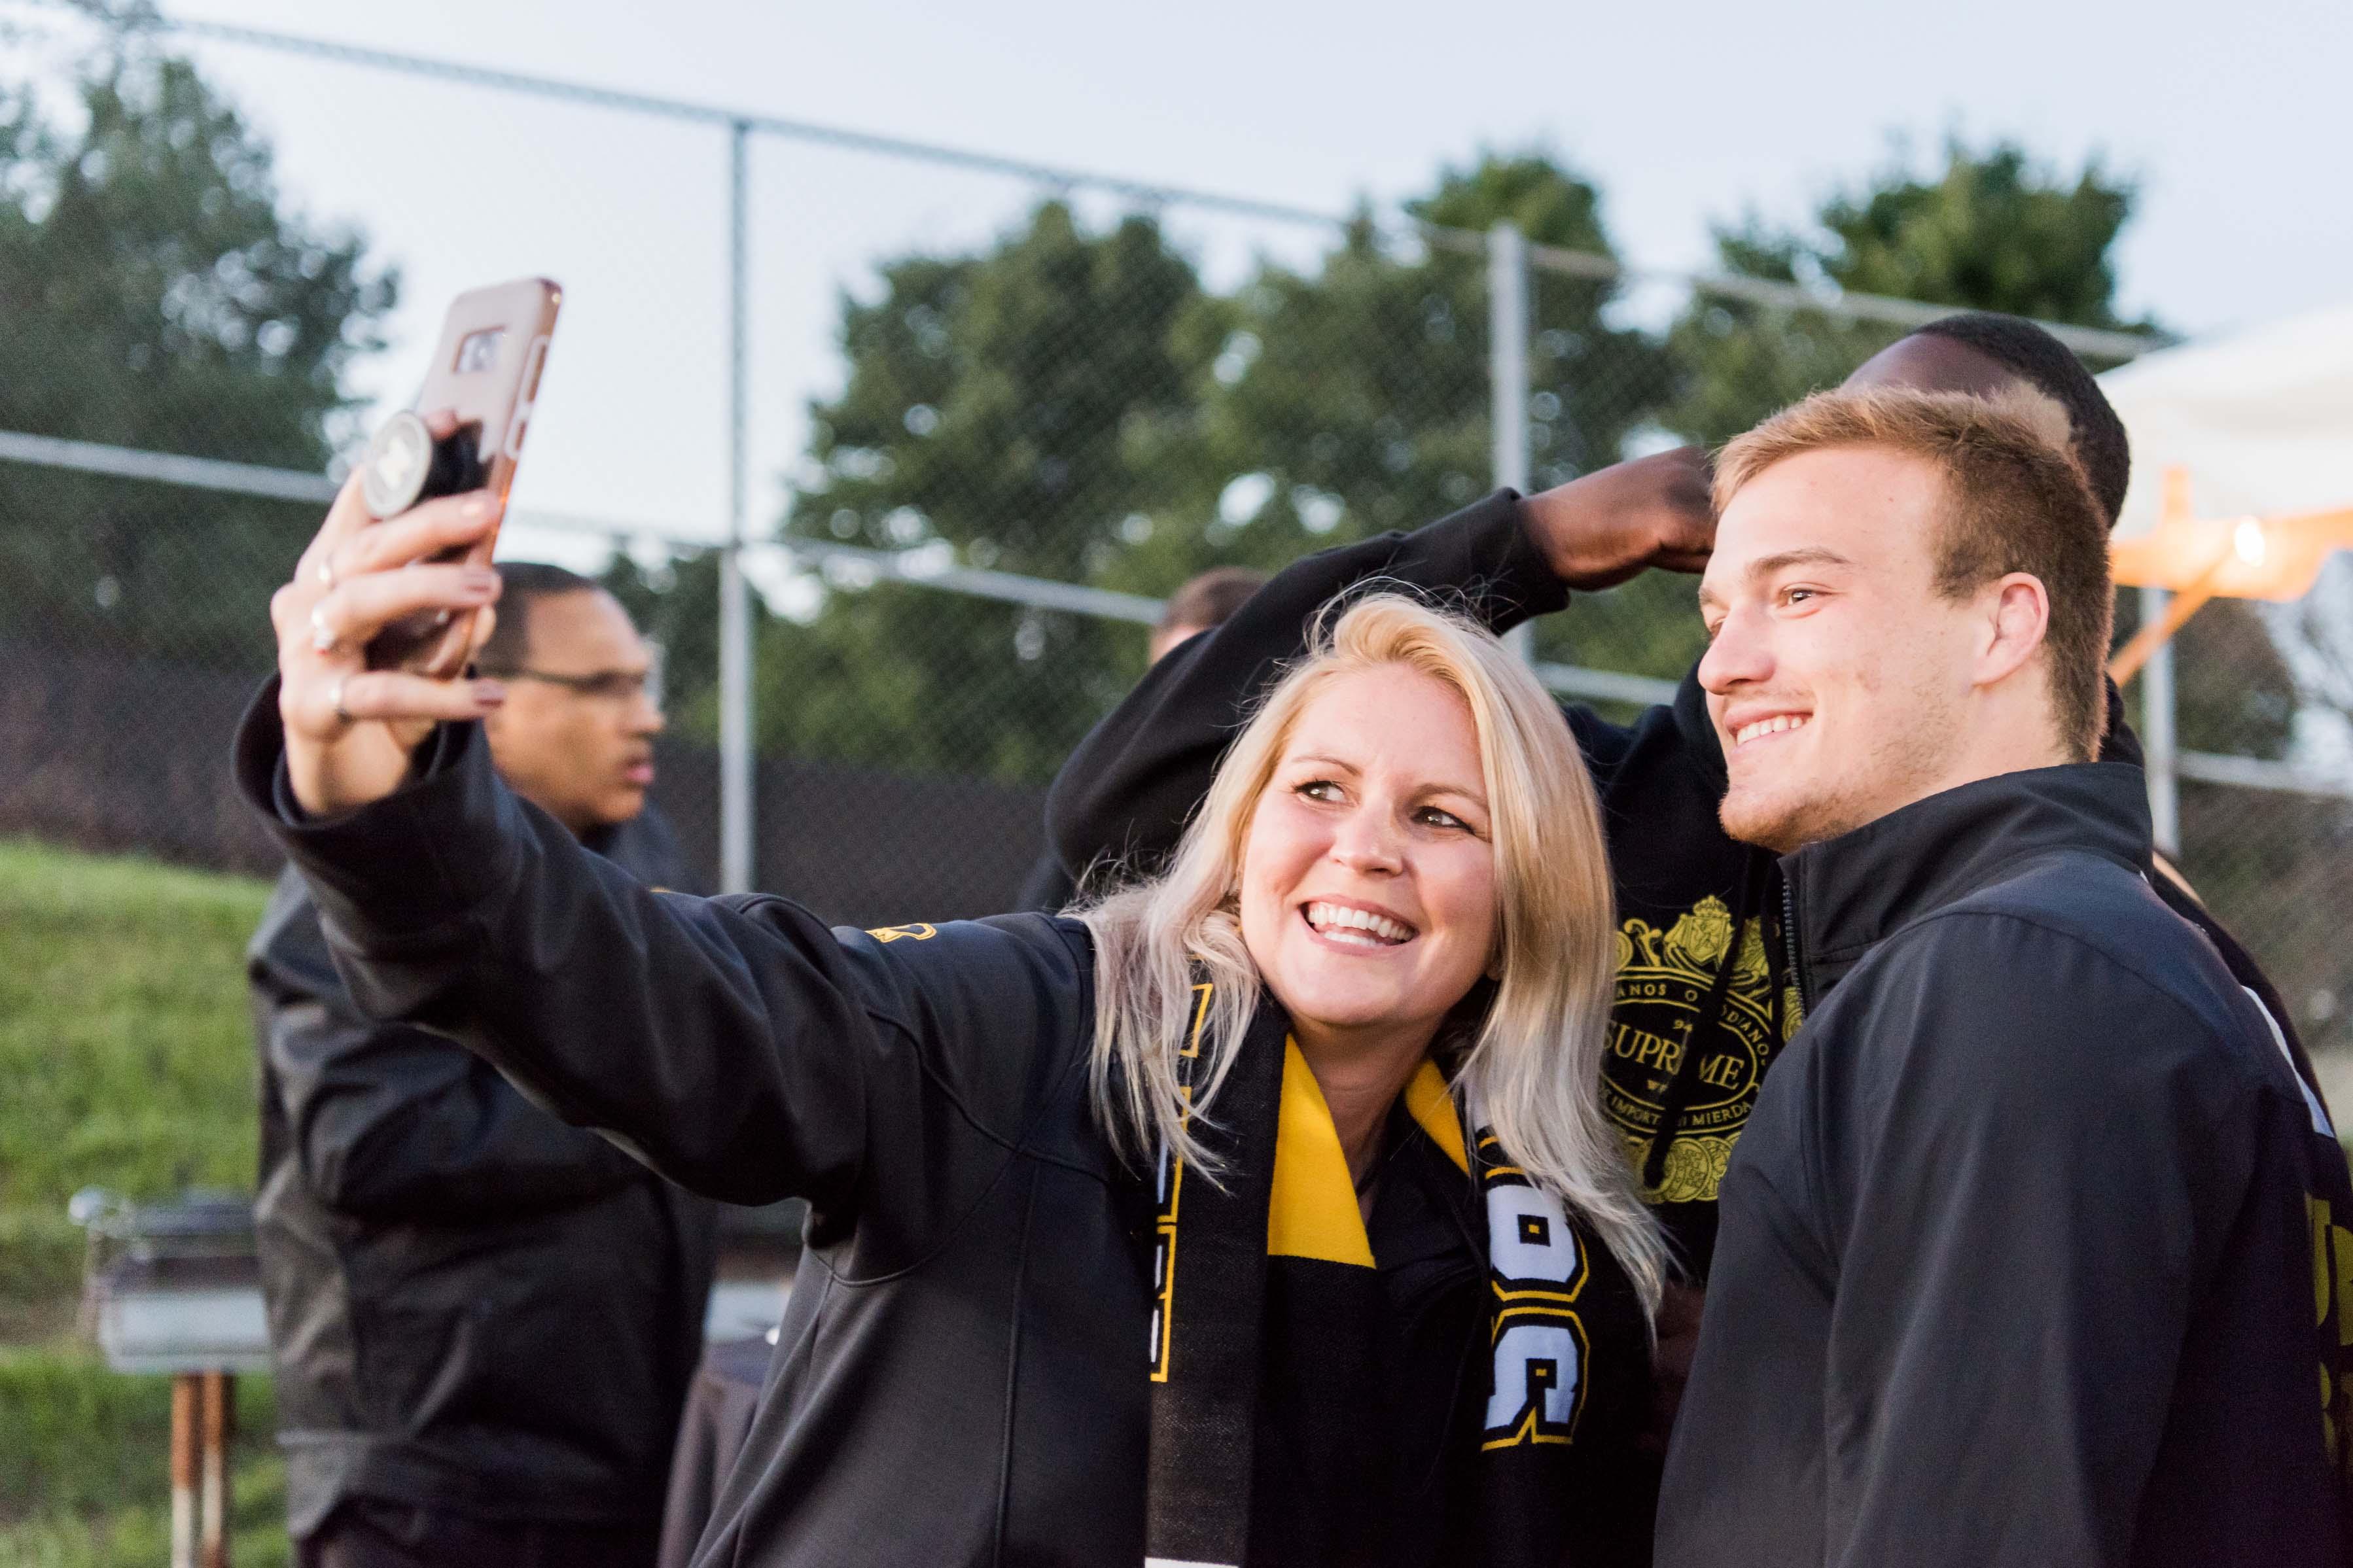 Three people take selfie on soccer field